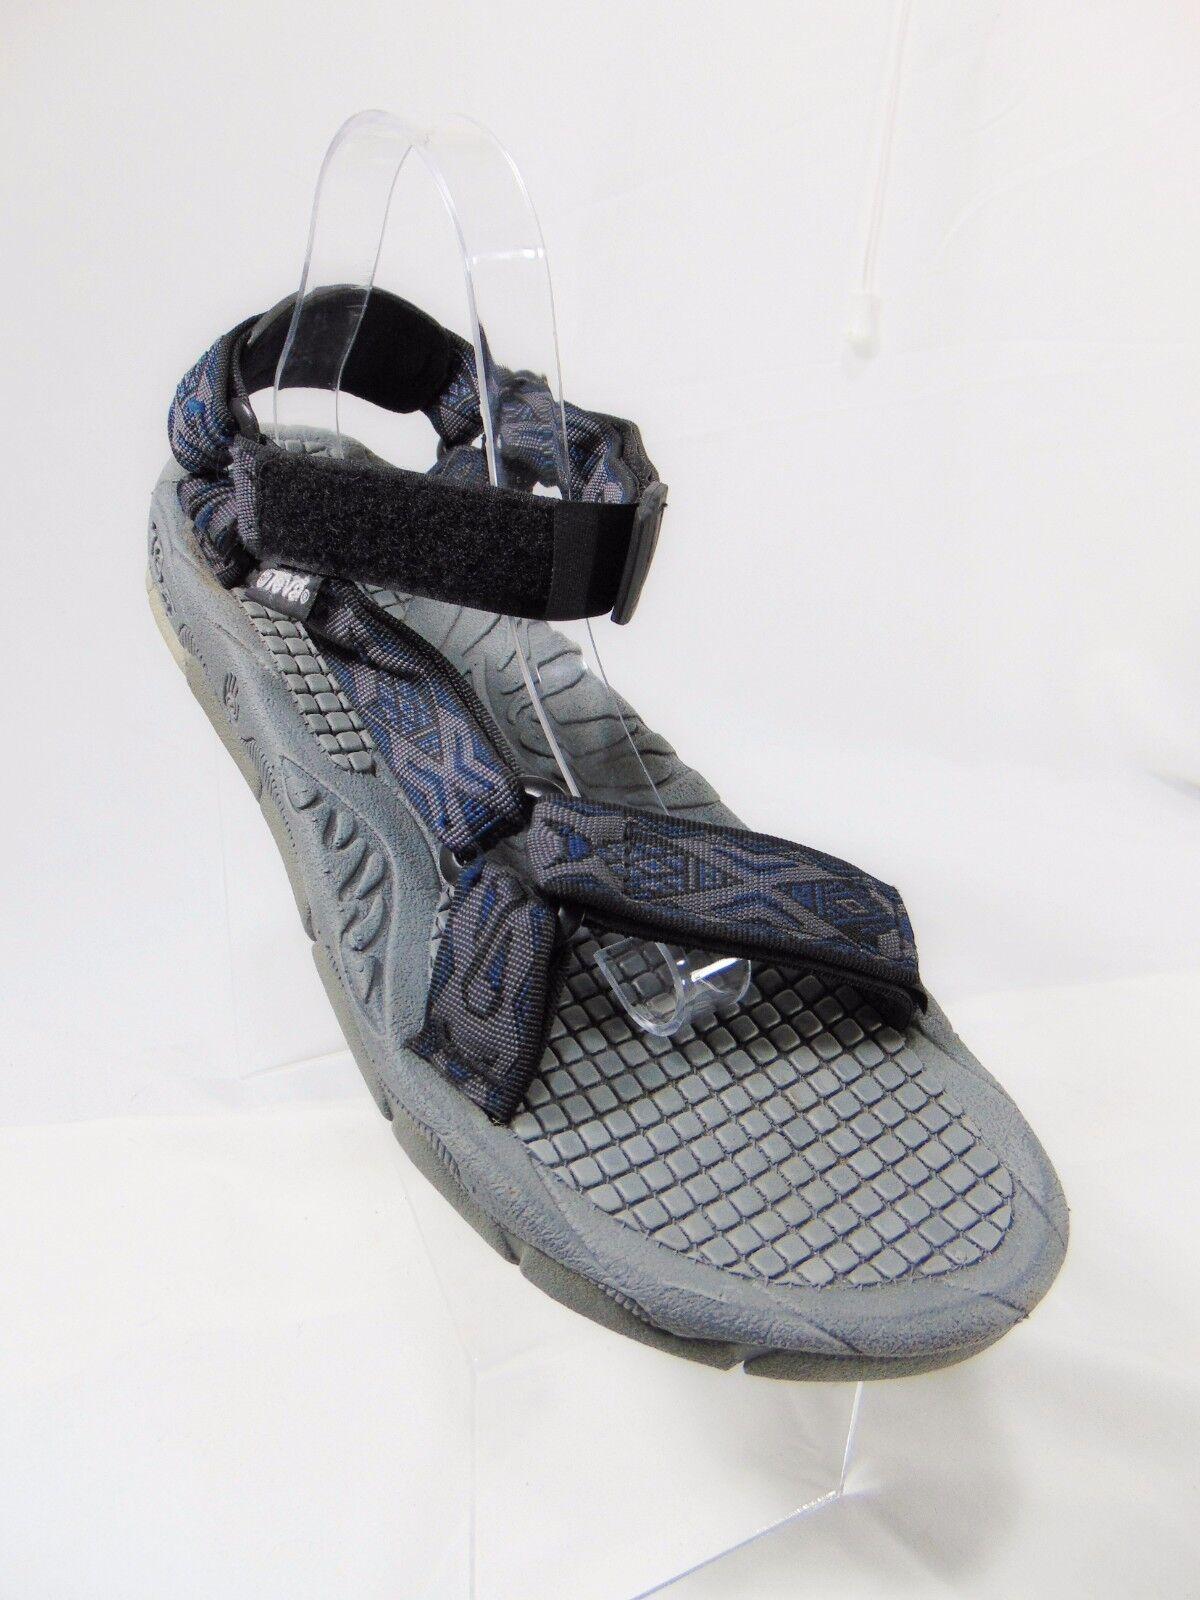 TEVA Valkyrie Men's Sport Sandals Water shoes Sz 13 M Trail Hiking Kayak F12k7